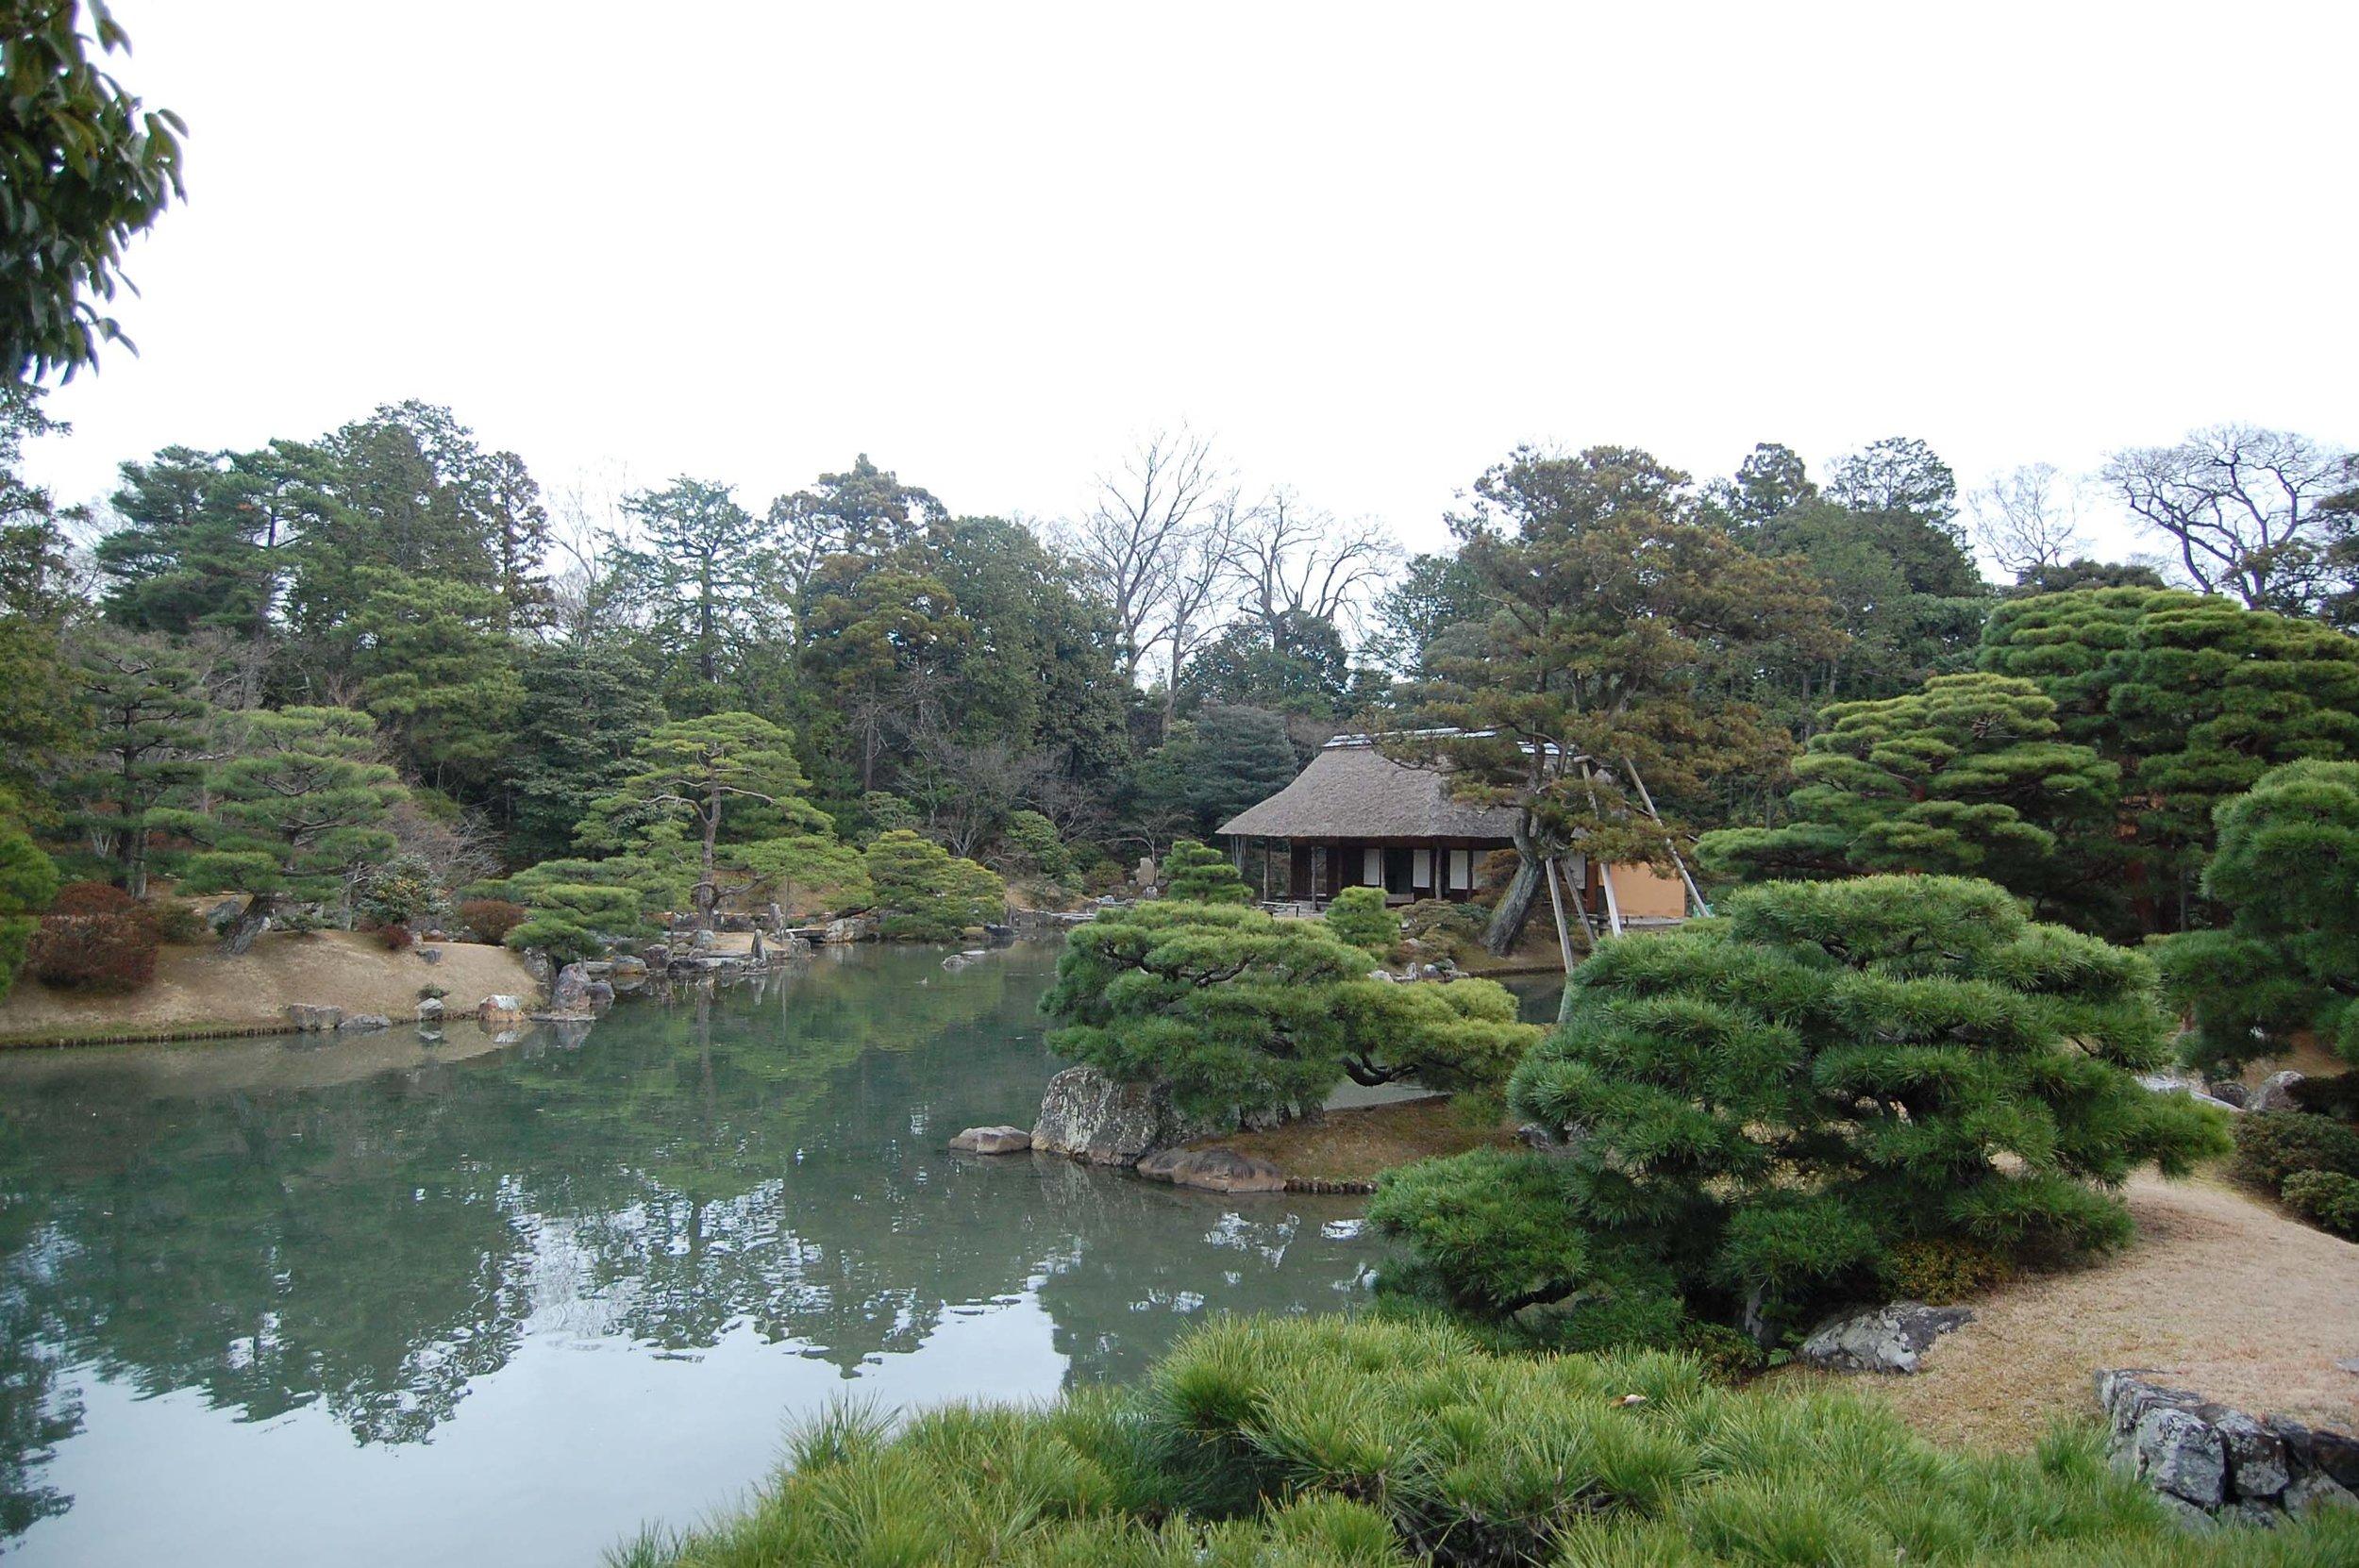 The garden at Katsura Imperial Villa, Kyoto, with  Shokin-tei  teahouse in the background. (photo: Raphael Azevedoo Franca, public domain image, WikiMedia Commons)